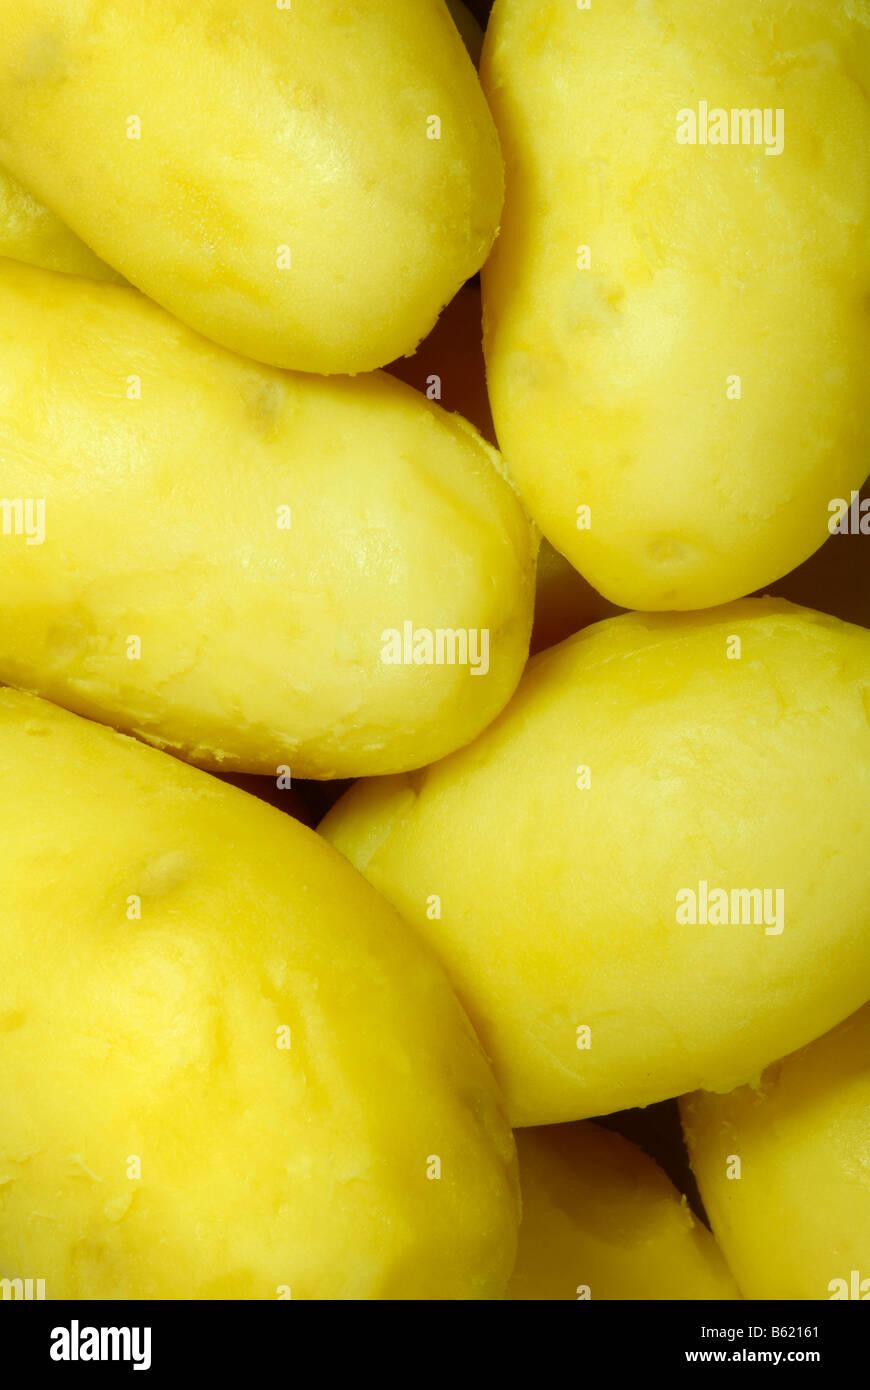 Potatoes, boiled and peeled Stock Photo